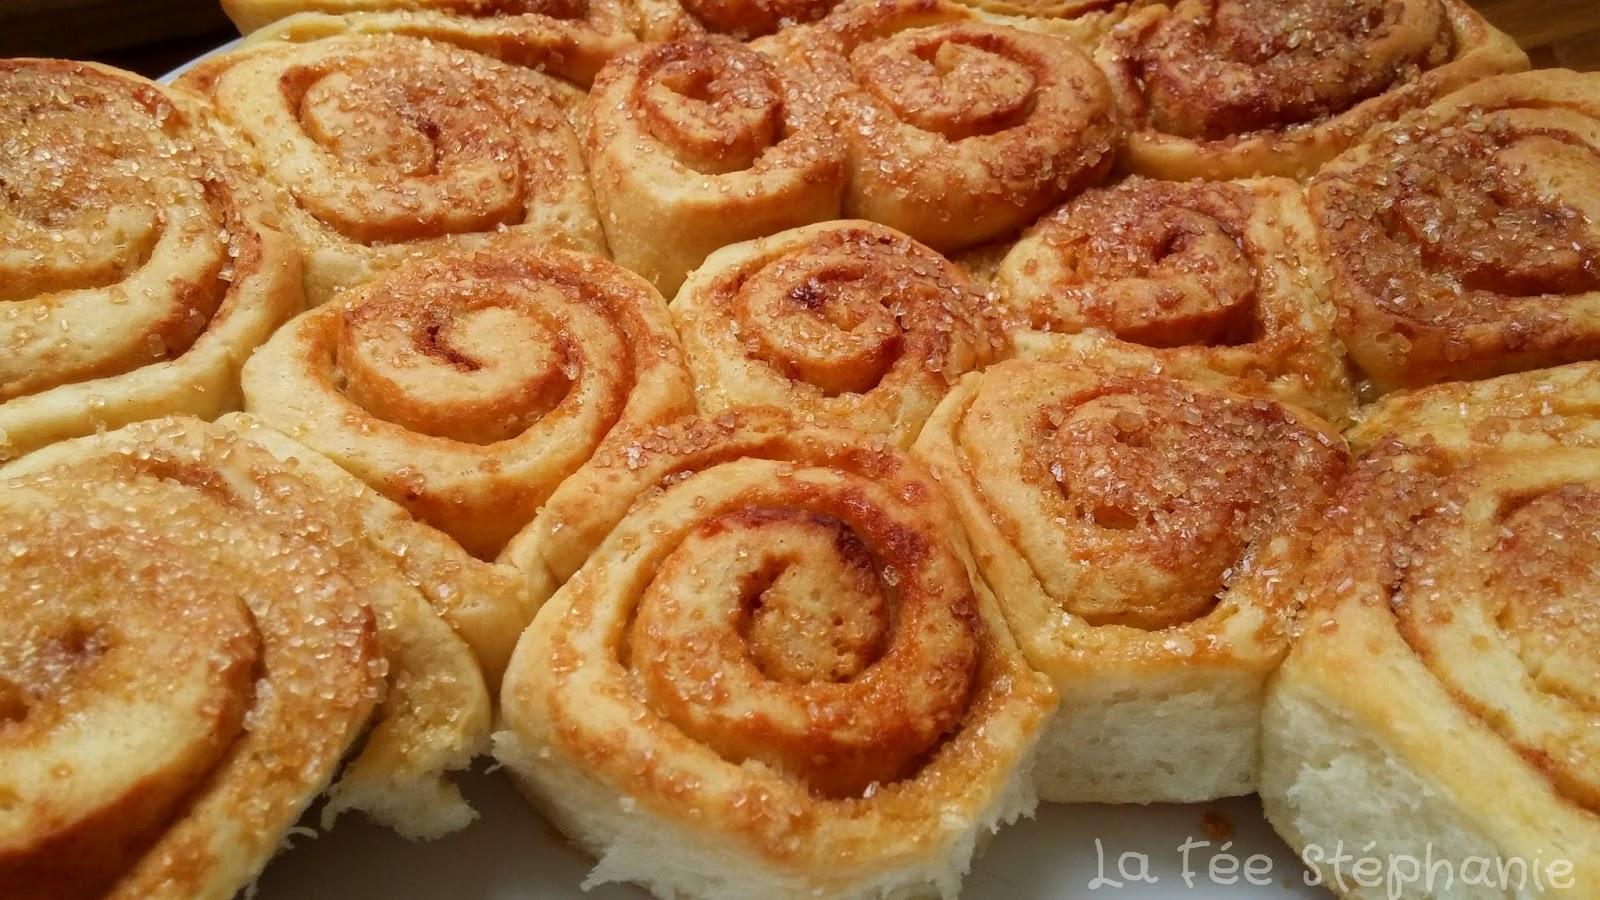 kanelbulle ou cinnamon rolls brioches roul es la